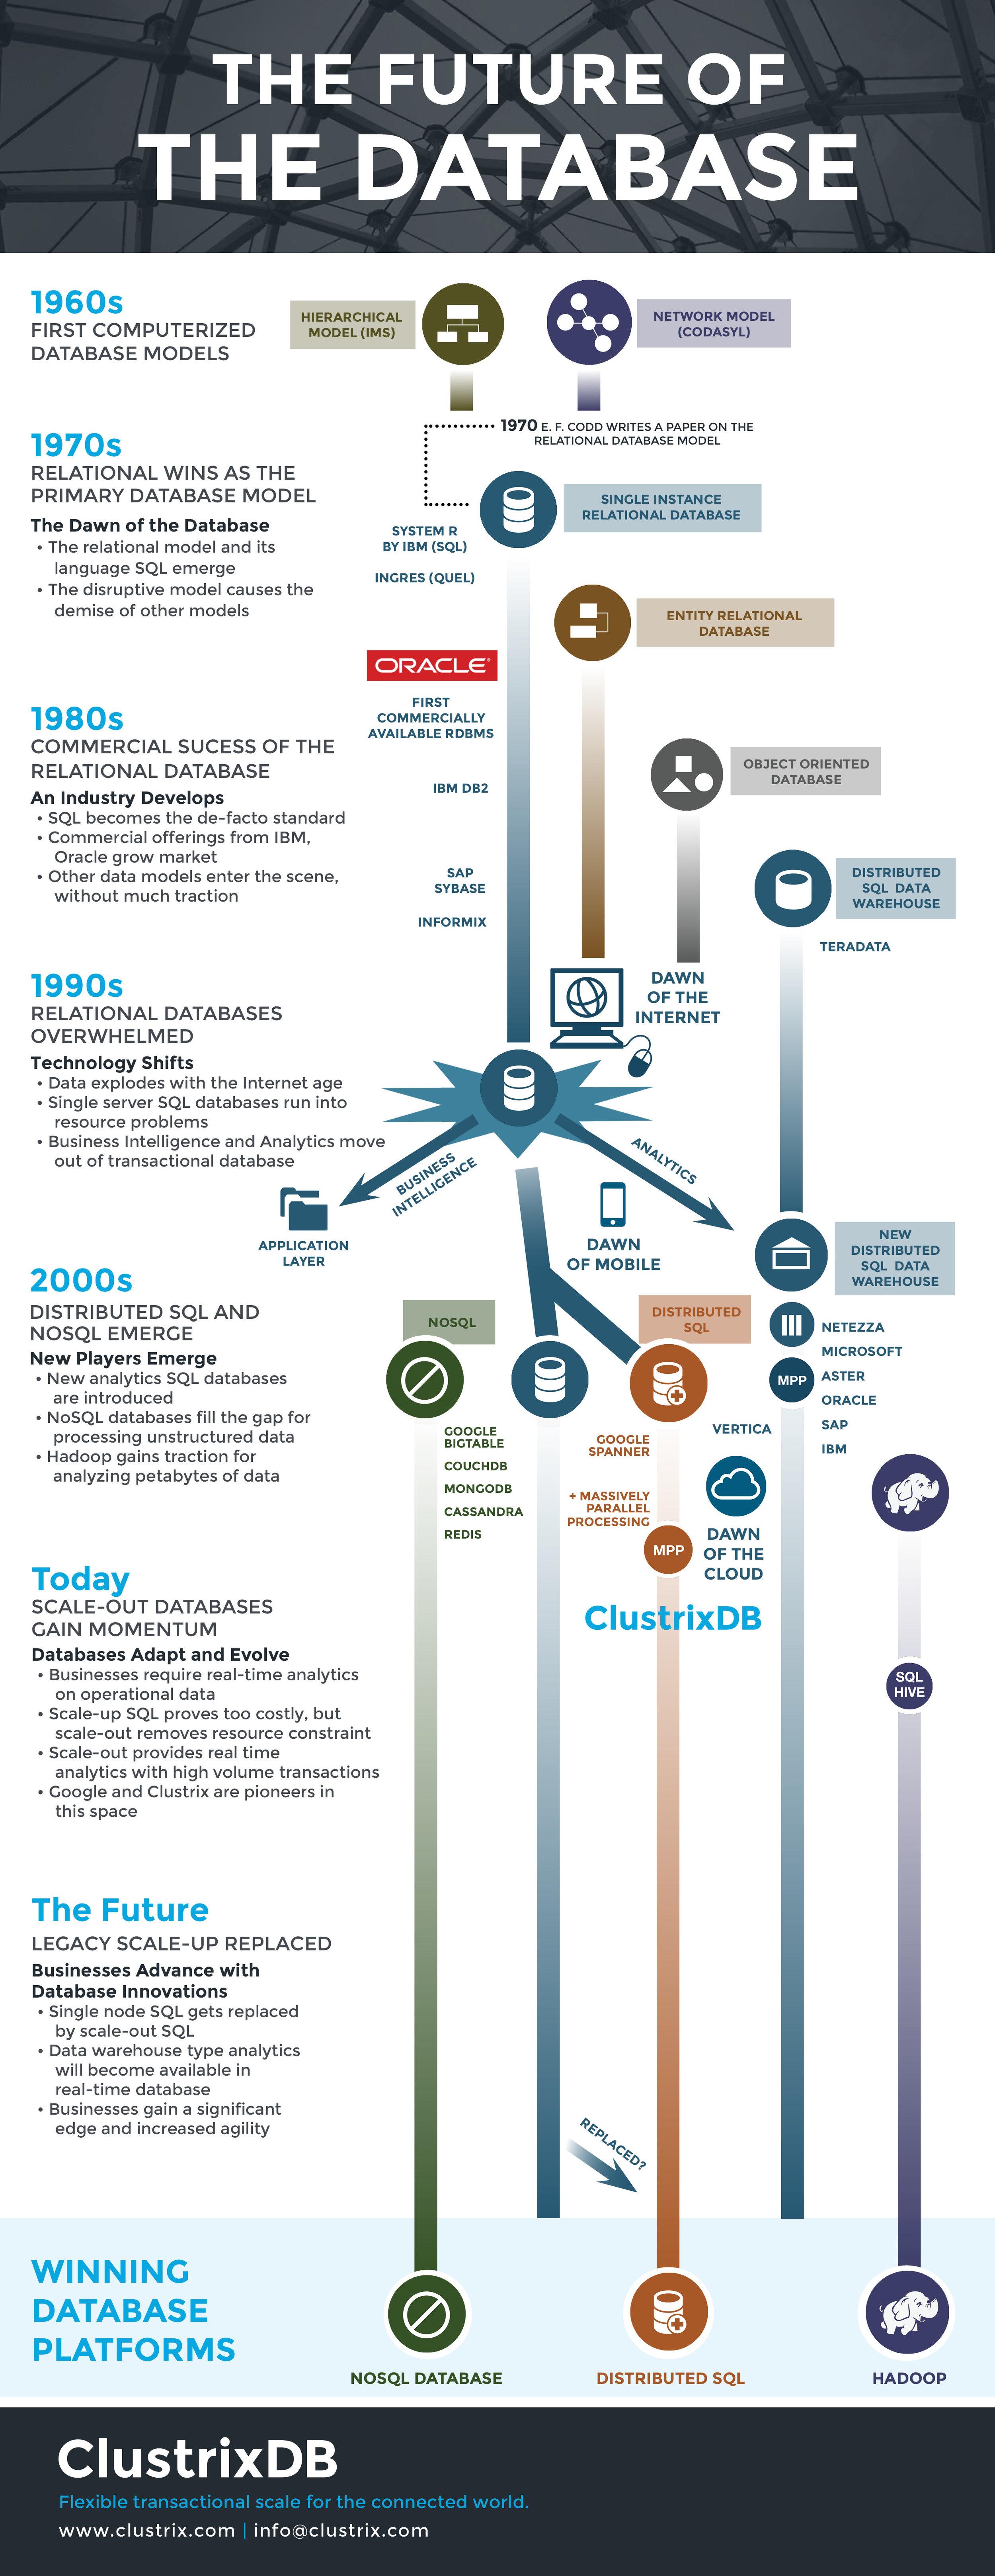 TheFutureoftheDatabase_Infographic.jpg